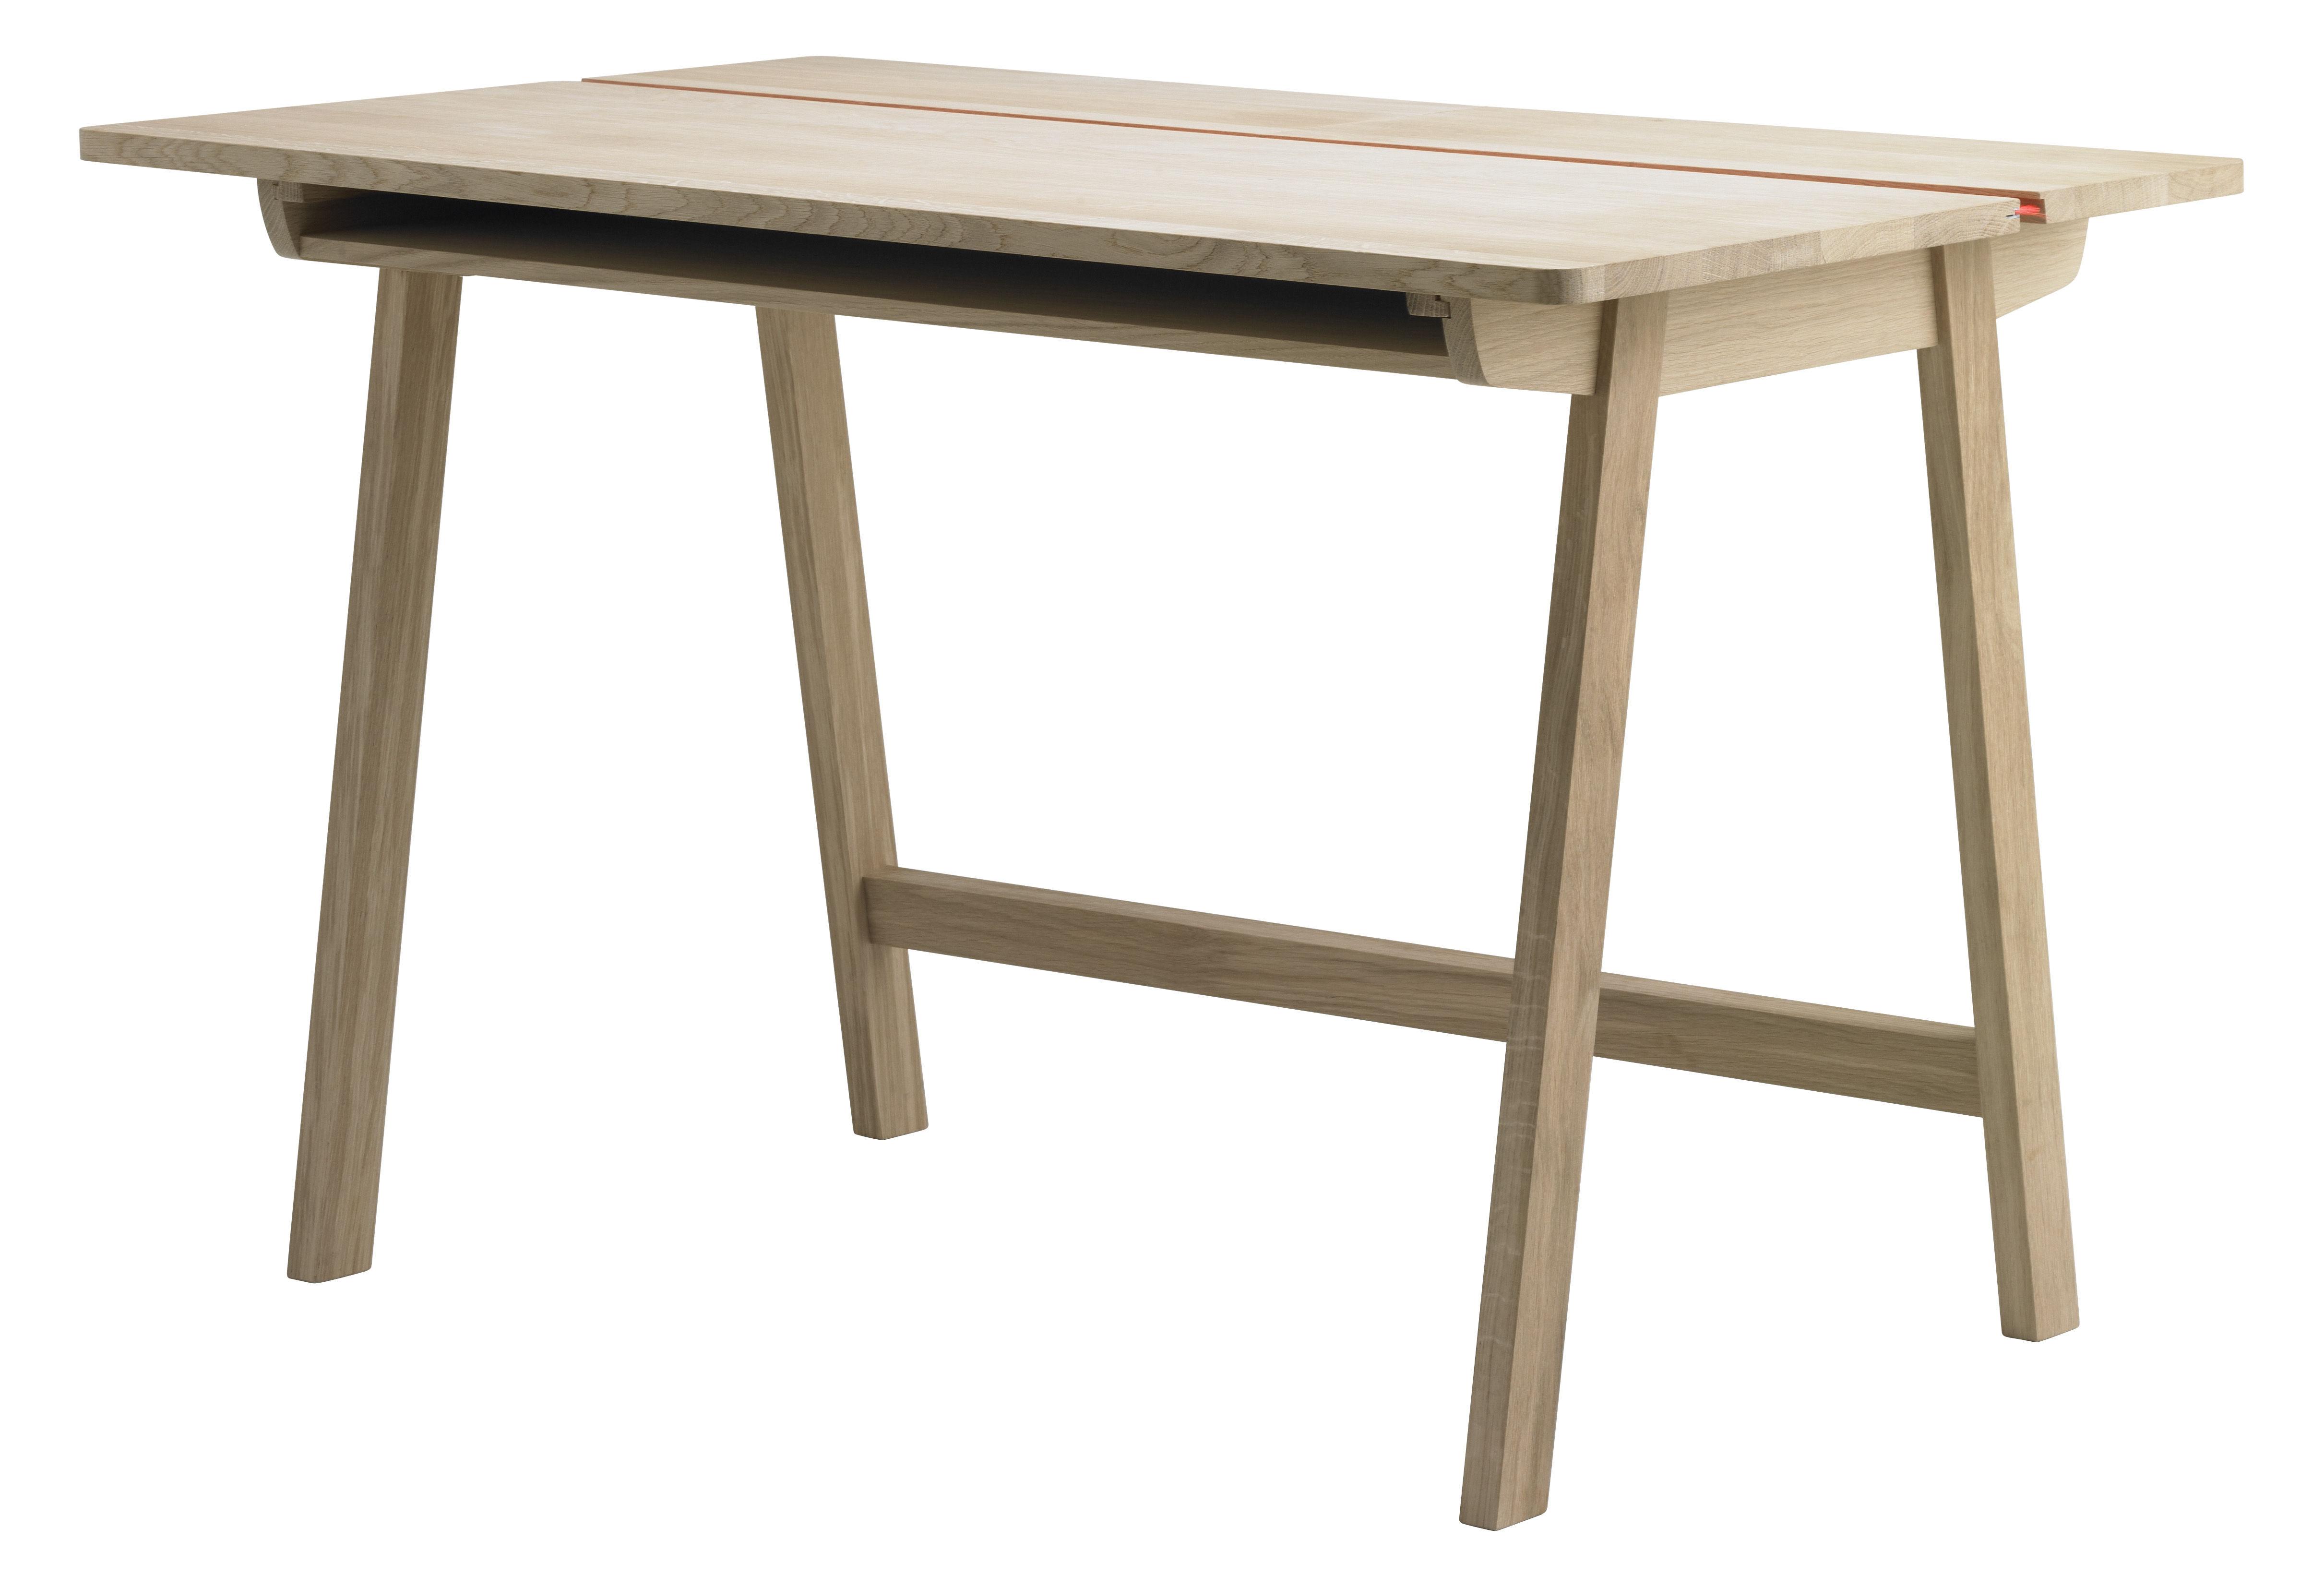 Furniture - Teen furniture - Landa Desk - L 120 cm by Alki - 120 x 70,5 cm - Natural oak - Oak, Plywood veneer oak